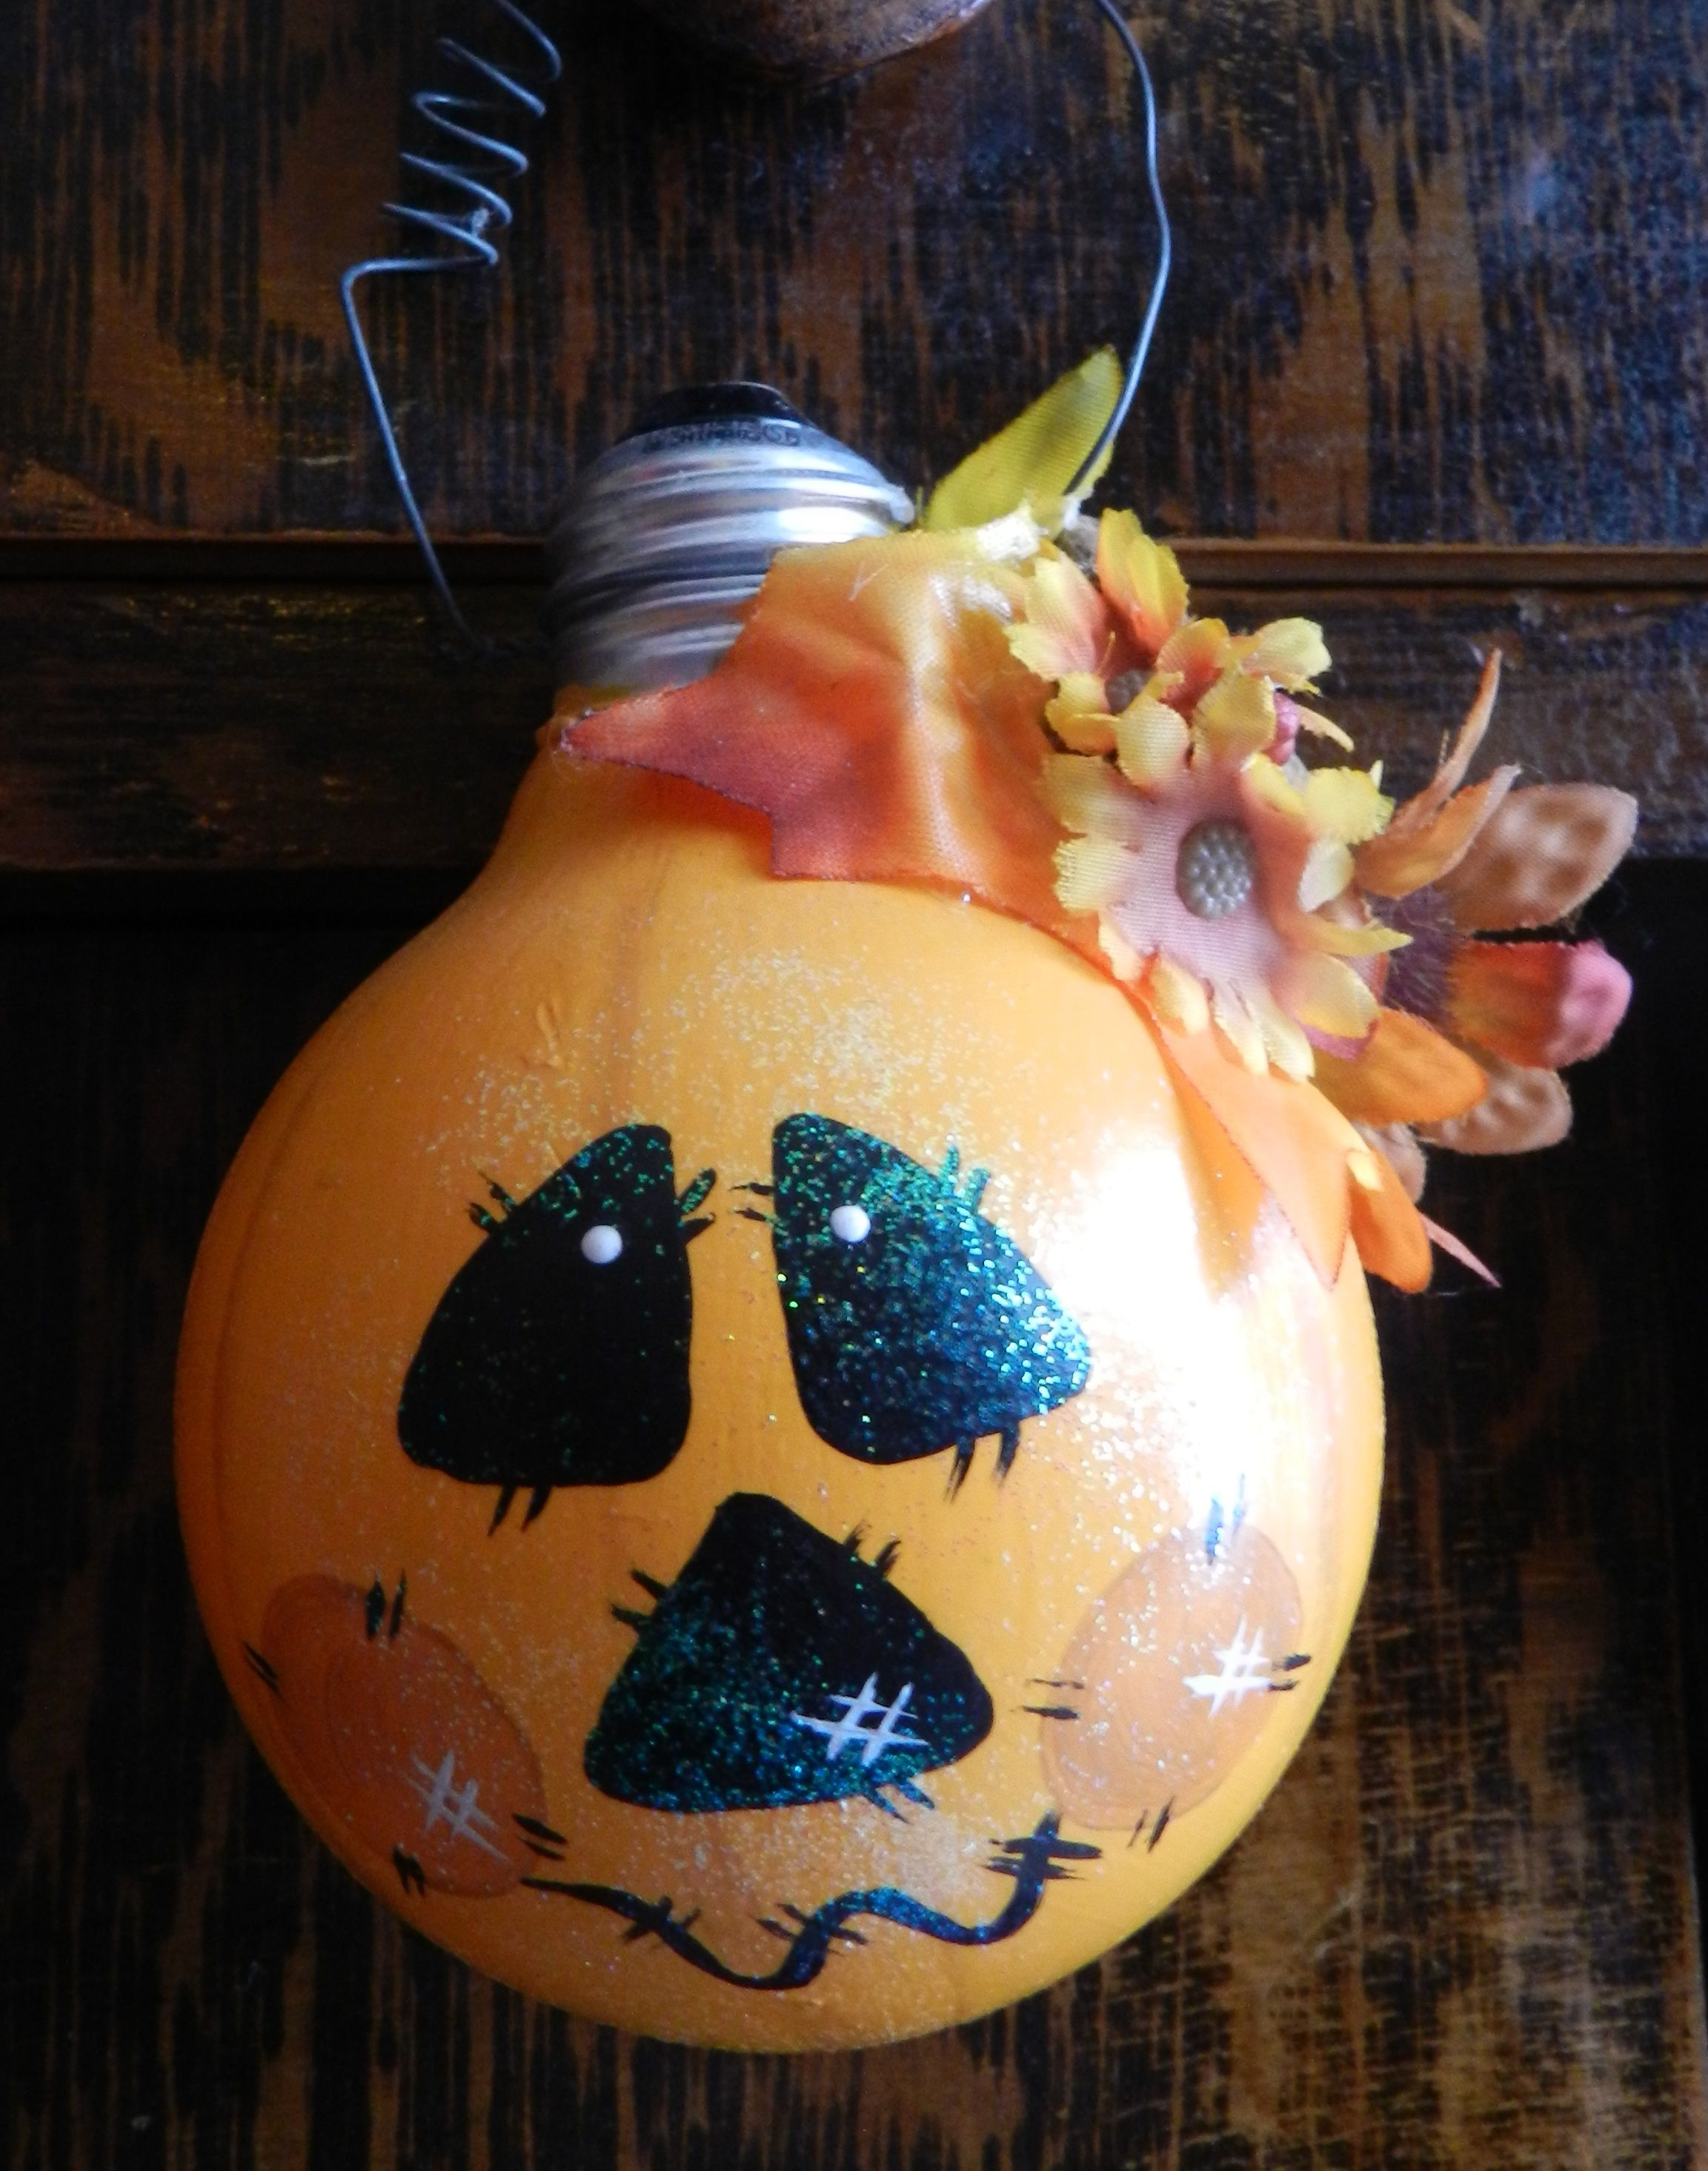 Painted Pumpkin Light Bulb Light Crafts Halloween Crafts Holiday Crafts